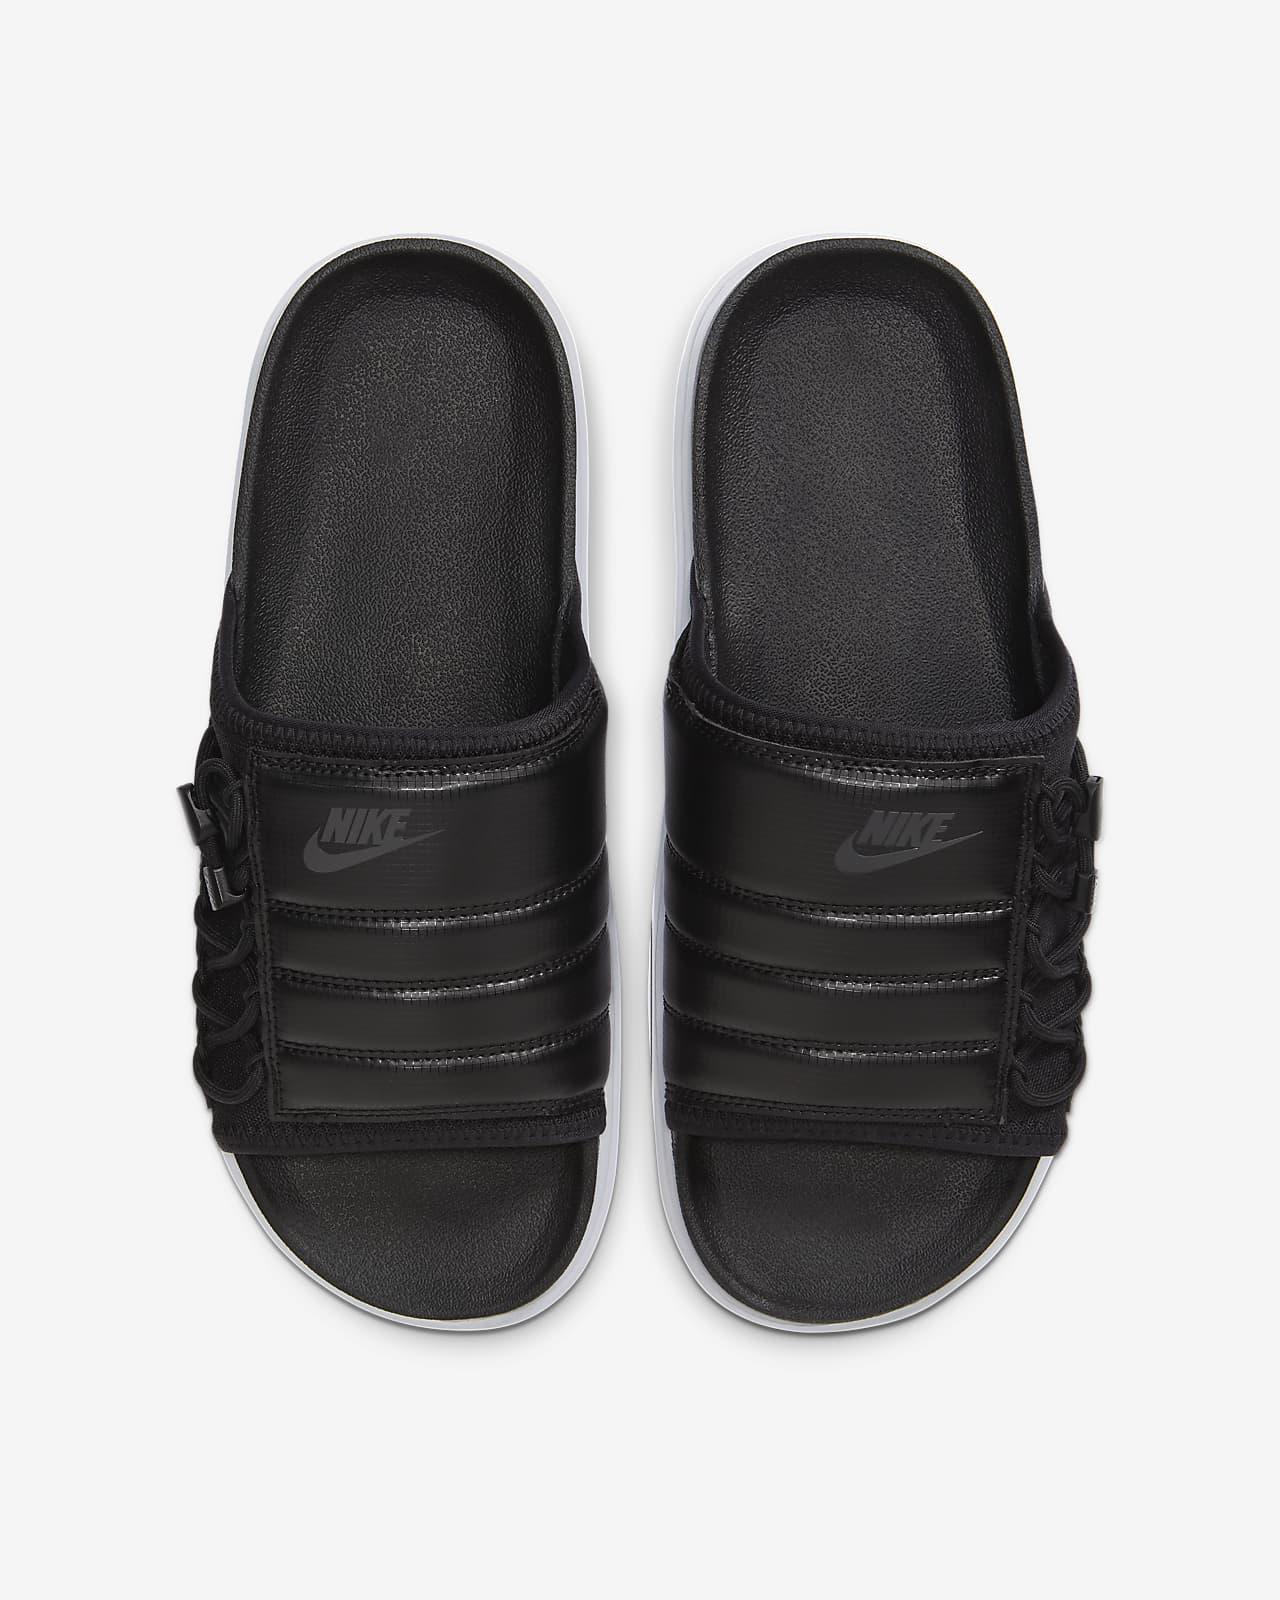 Nike Asuna Men's Slide. Nike SA